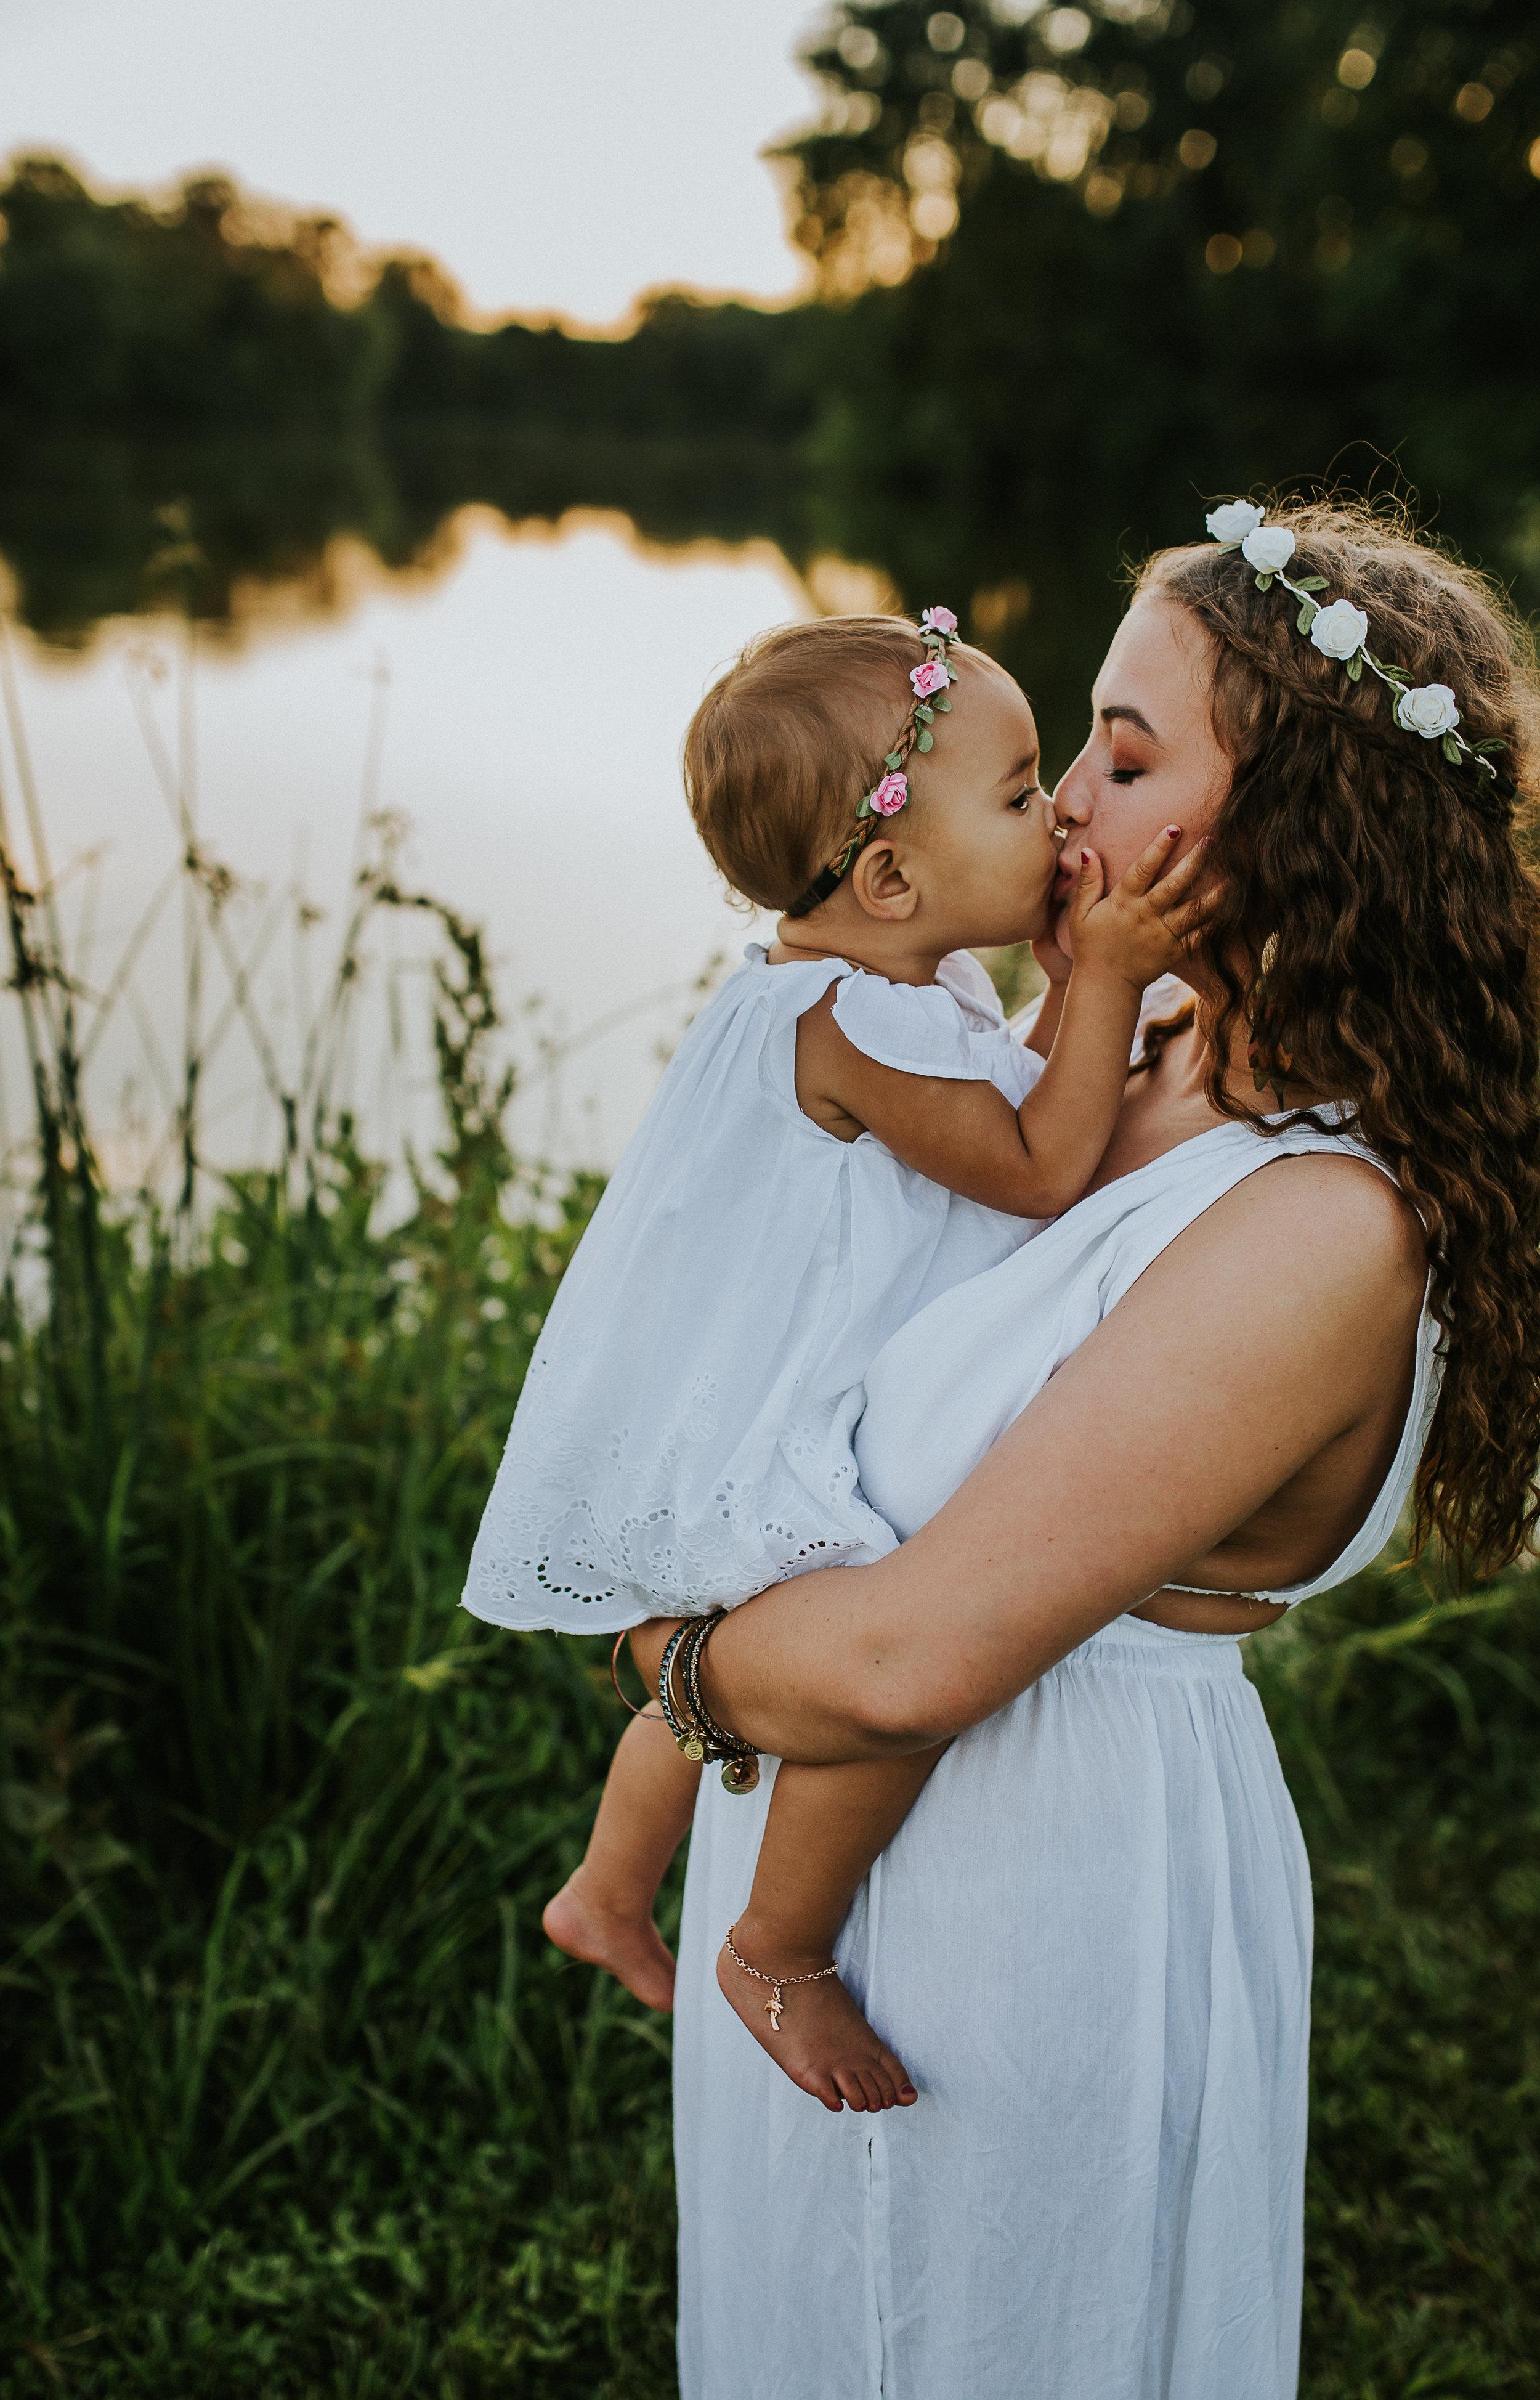 mommy&me76.jpg